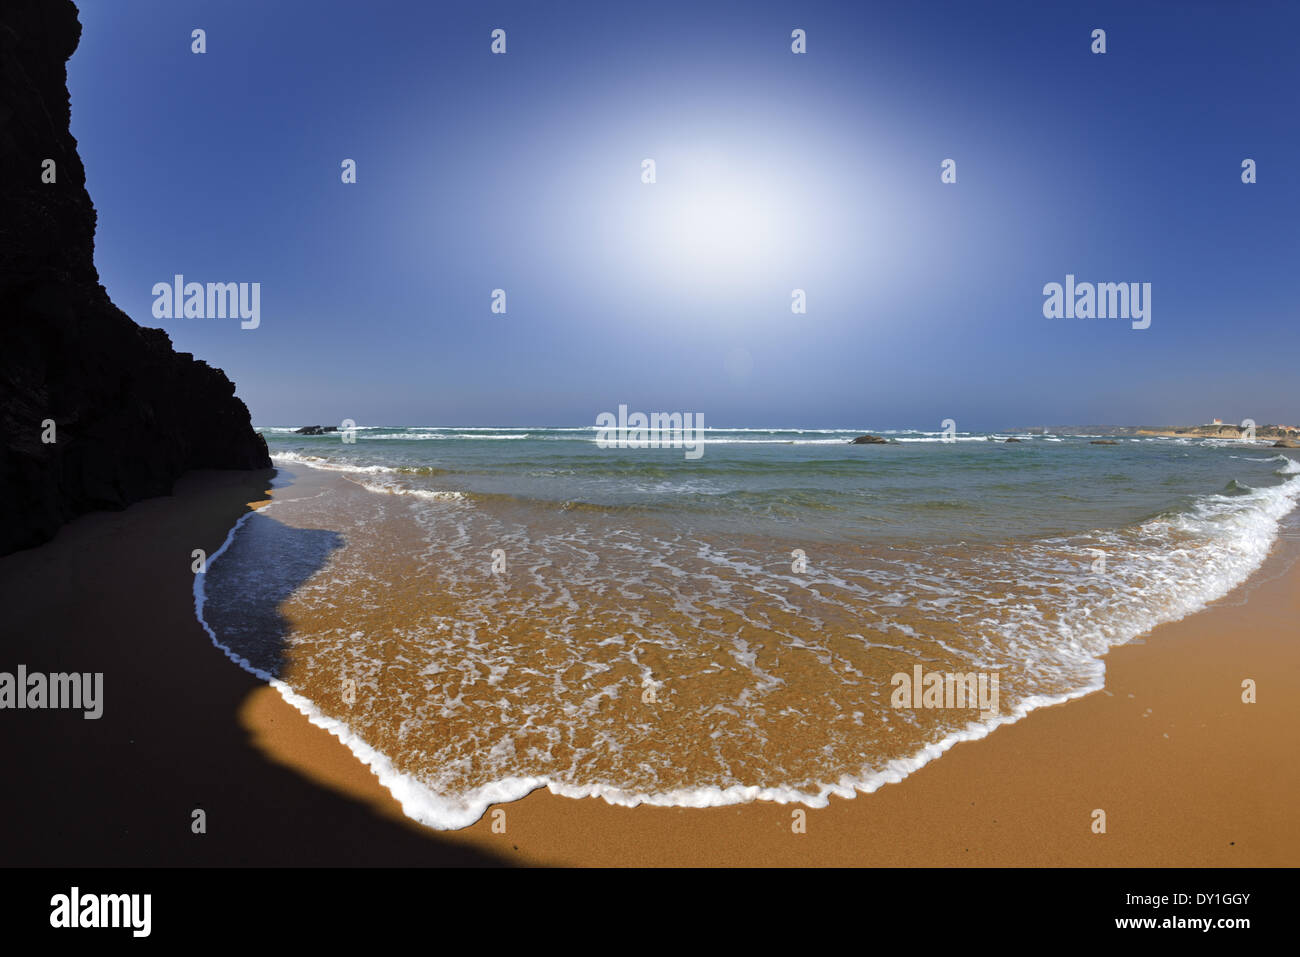 Portugal, Alentejo, Nature Park Costa Vicentina and Southwest of Alentejo, beach, Praia de Furnas, green water, clean, transparent, sand, rocks, sun, sunny, estuary, river Mira, ocean, sea, coast, travel, tourism, seascape, calm, no people, wide, natual, Stock Photo